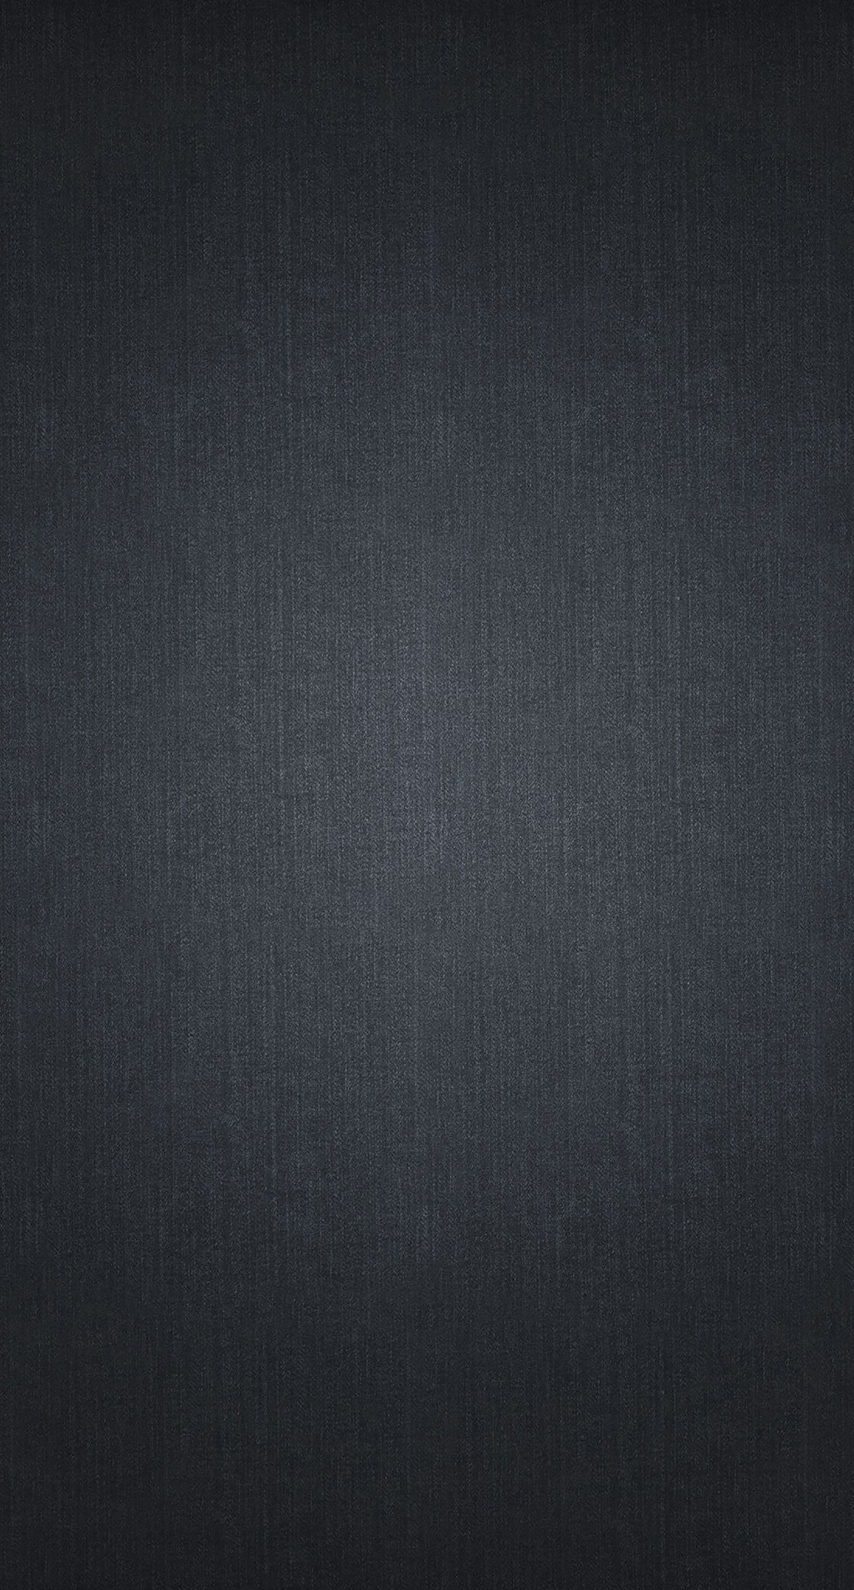 fabric, canvas